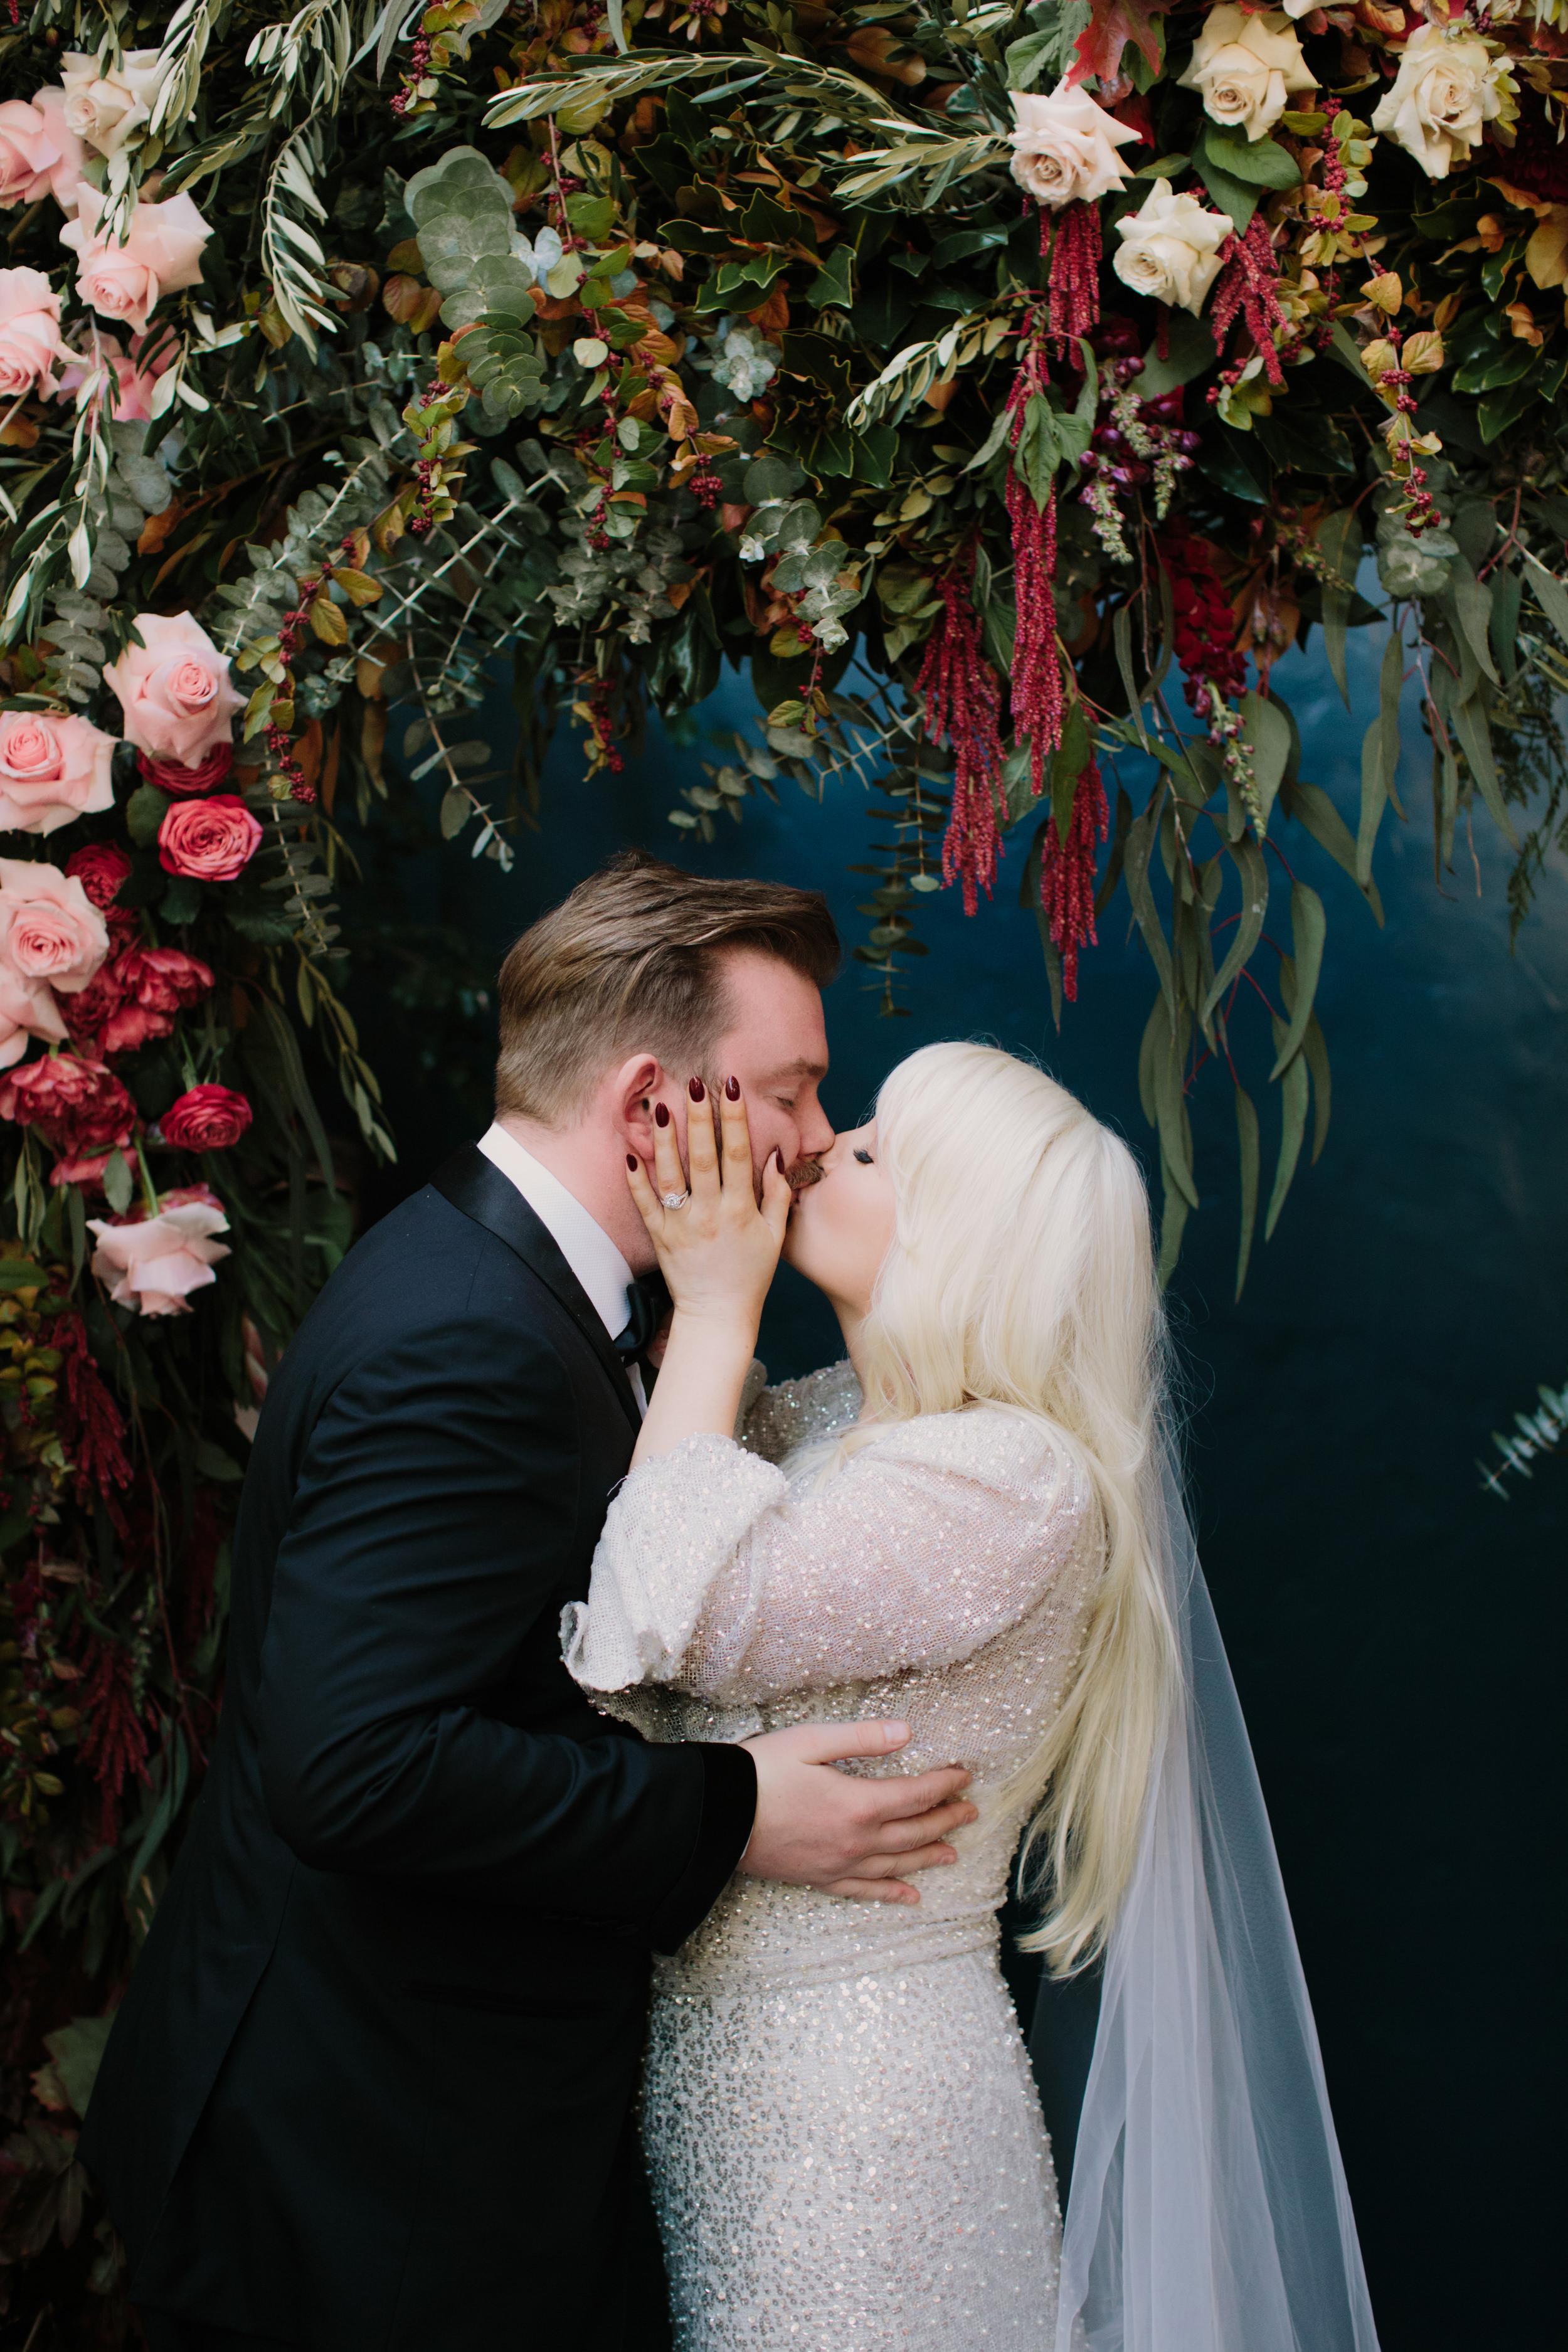 I-Got-You-Babe-Weddings-Tori-Will-Rupert0053.JPG